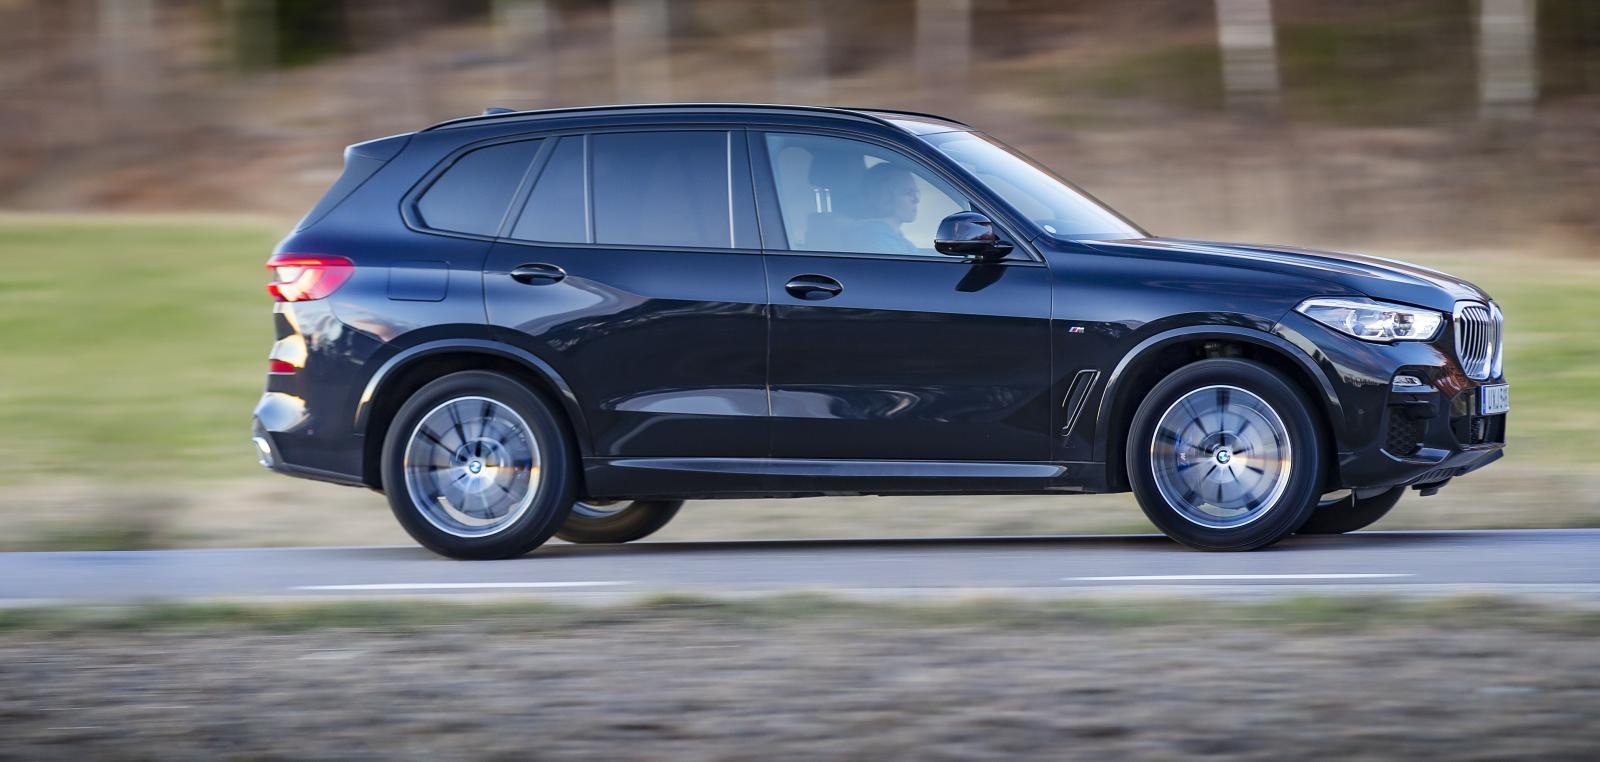 Åtta modeller från BMW påverkas, bland annat X5 xDrive45e. Foto: Niklas Carle